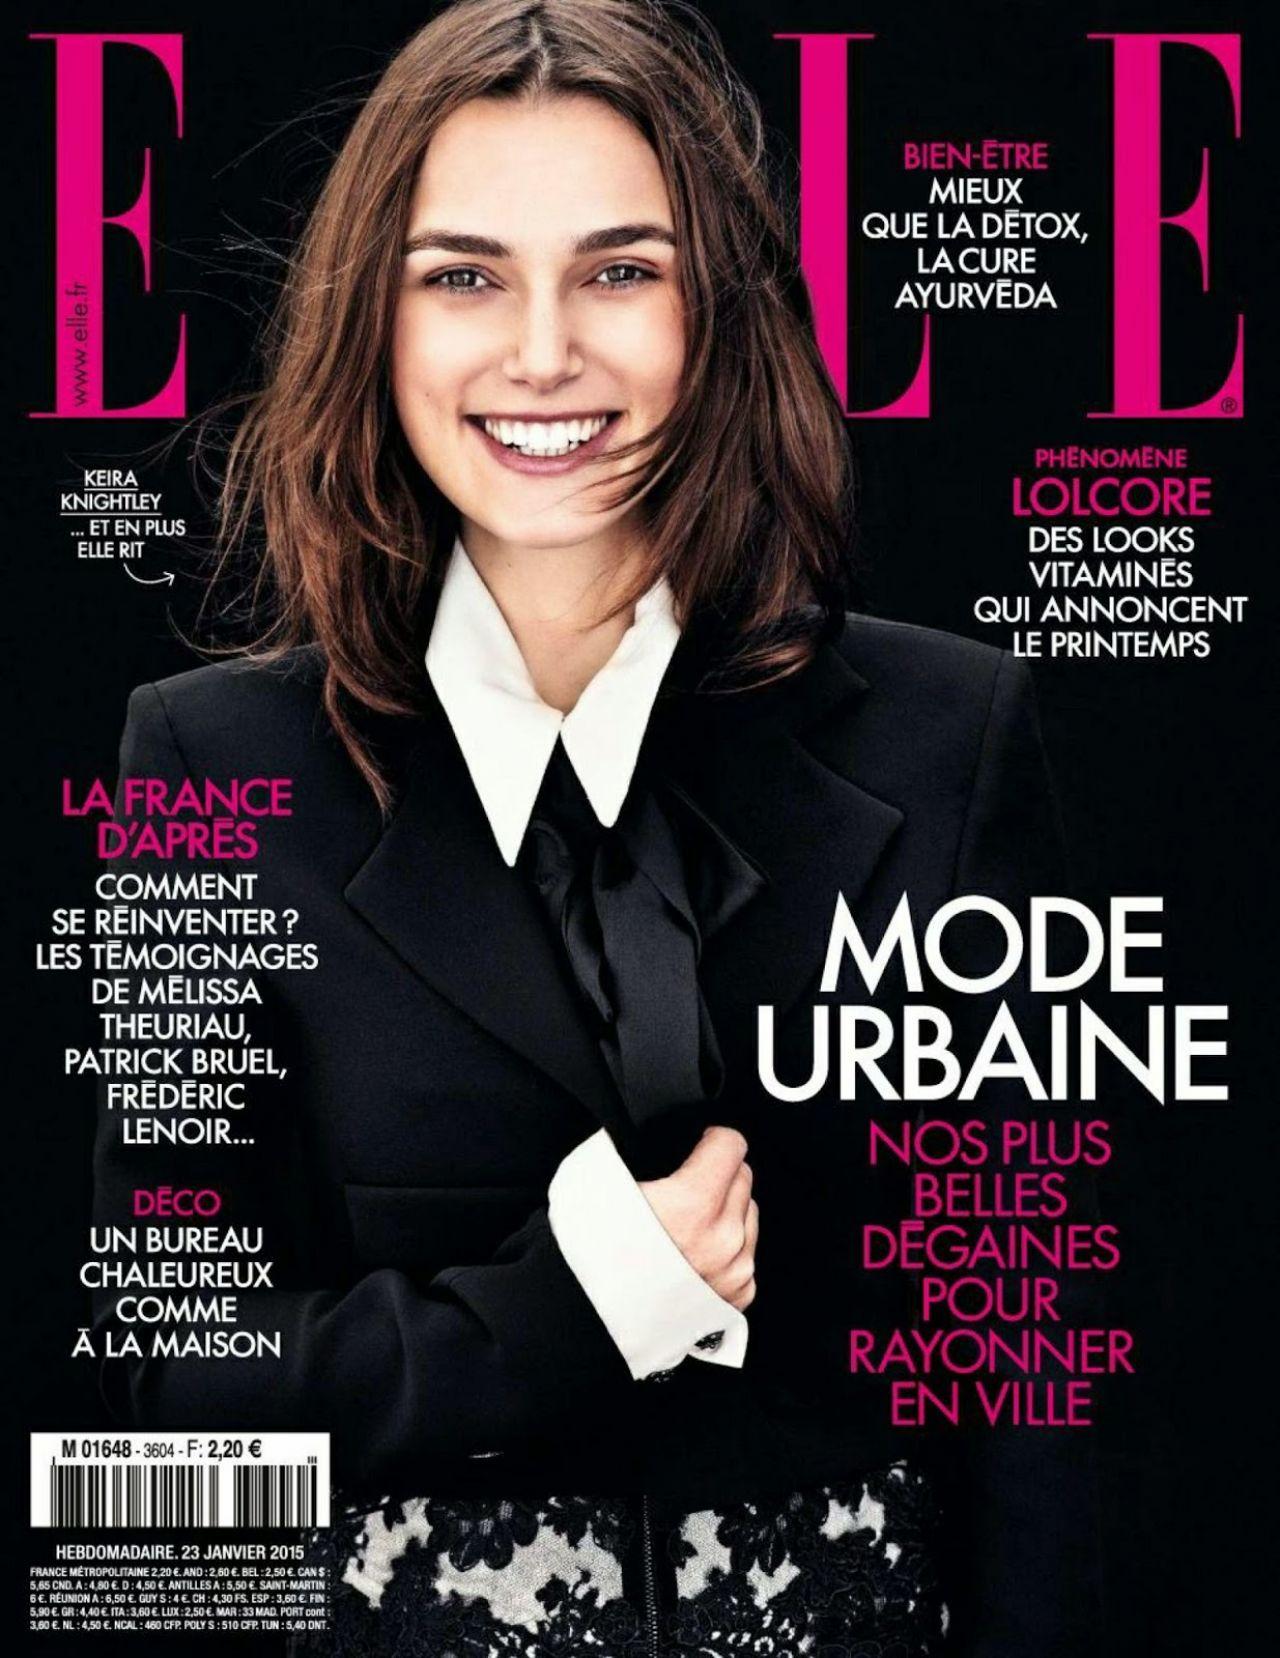 London Fashion Magazines List